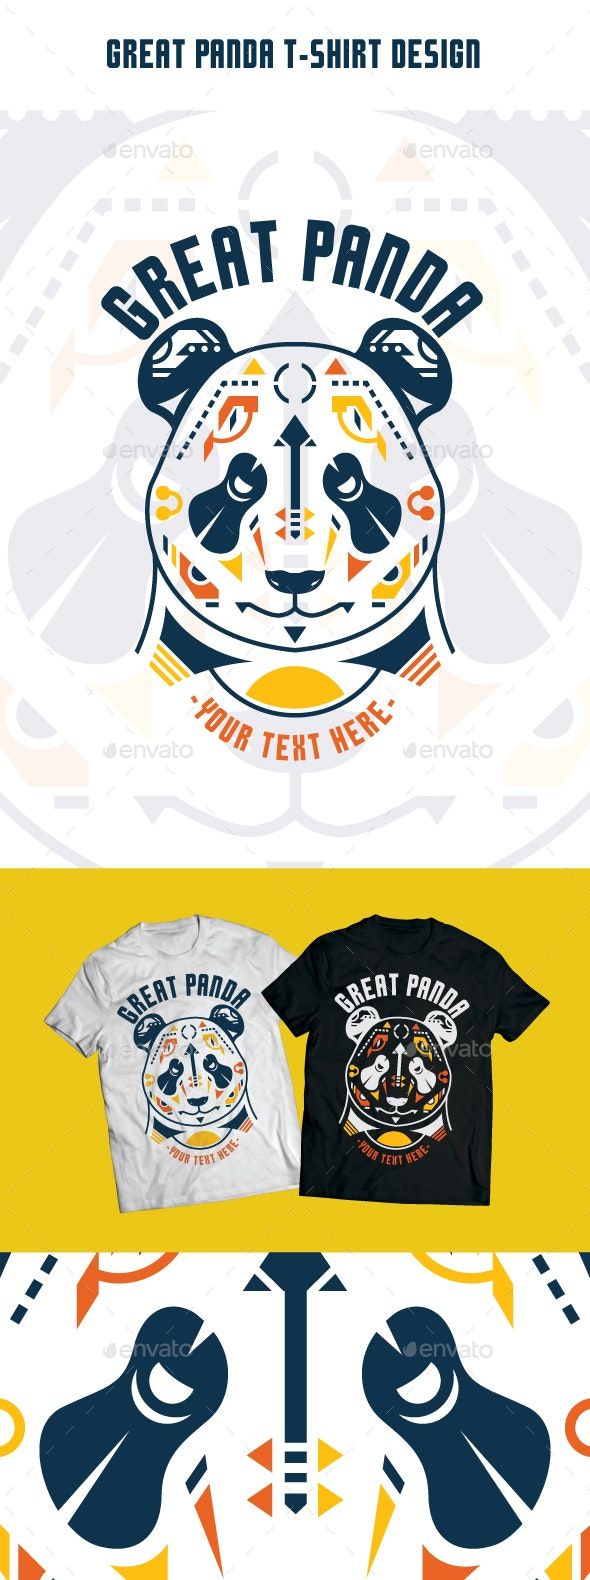 Great Panda T-Shirt Design - T-Shirts